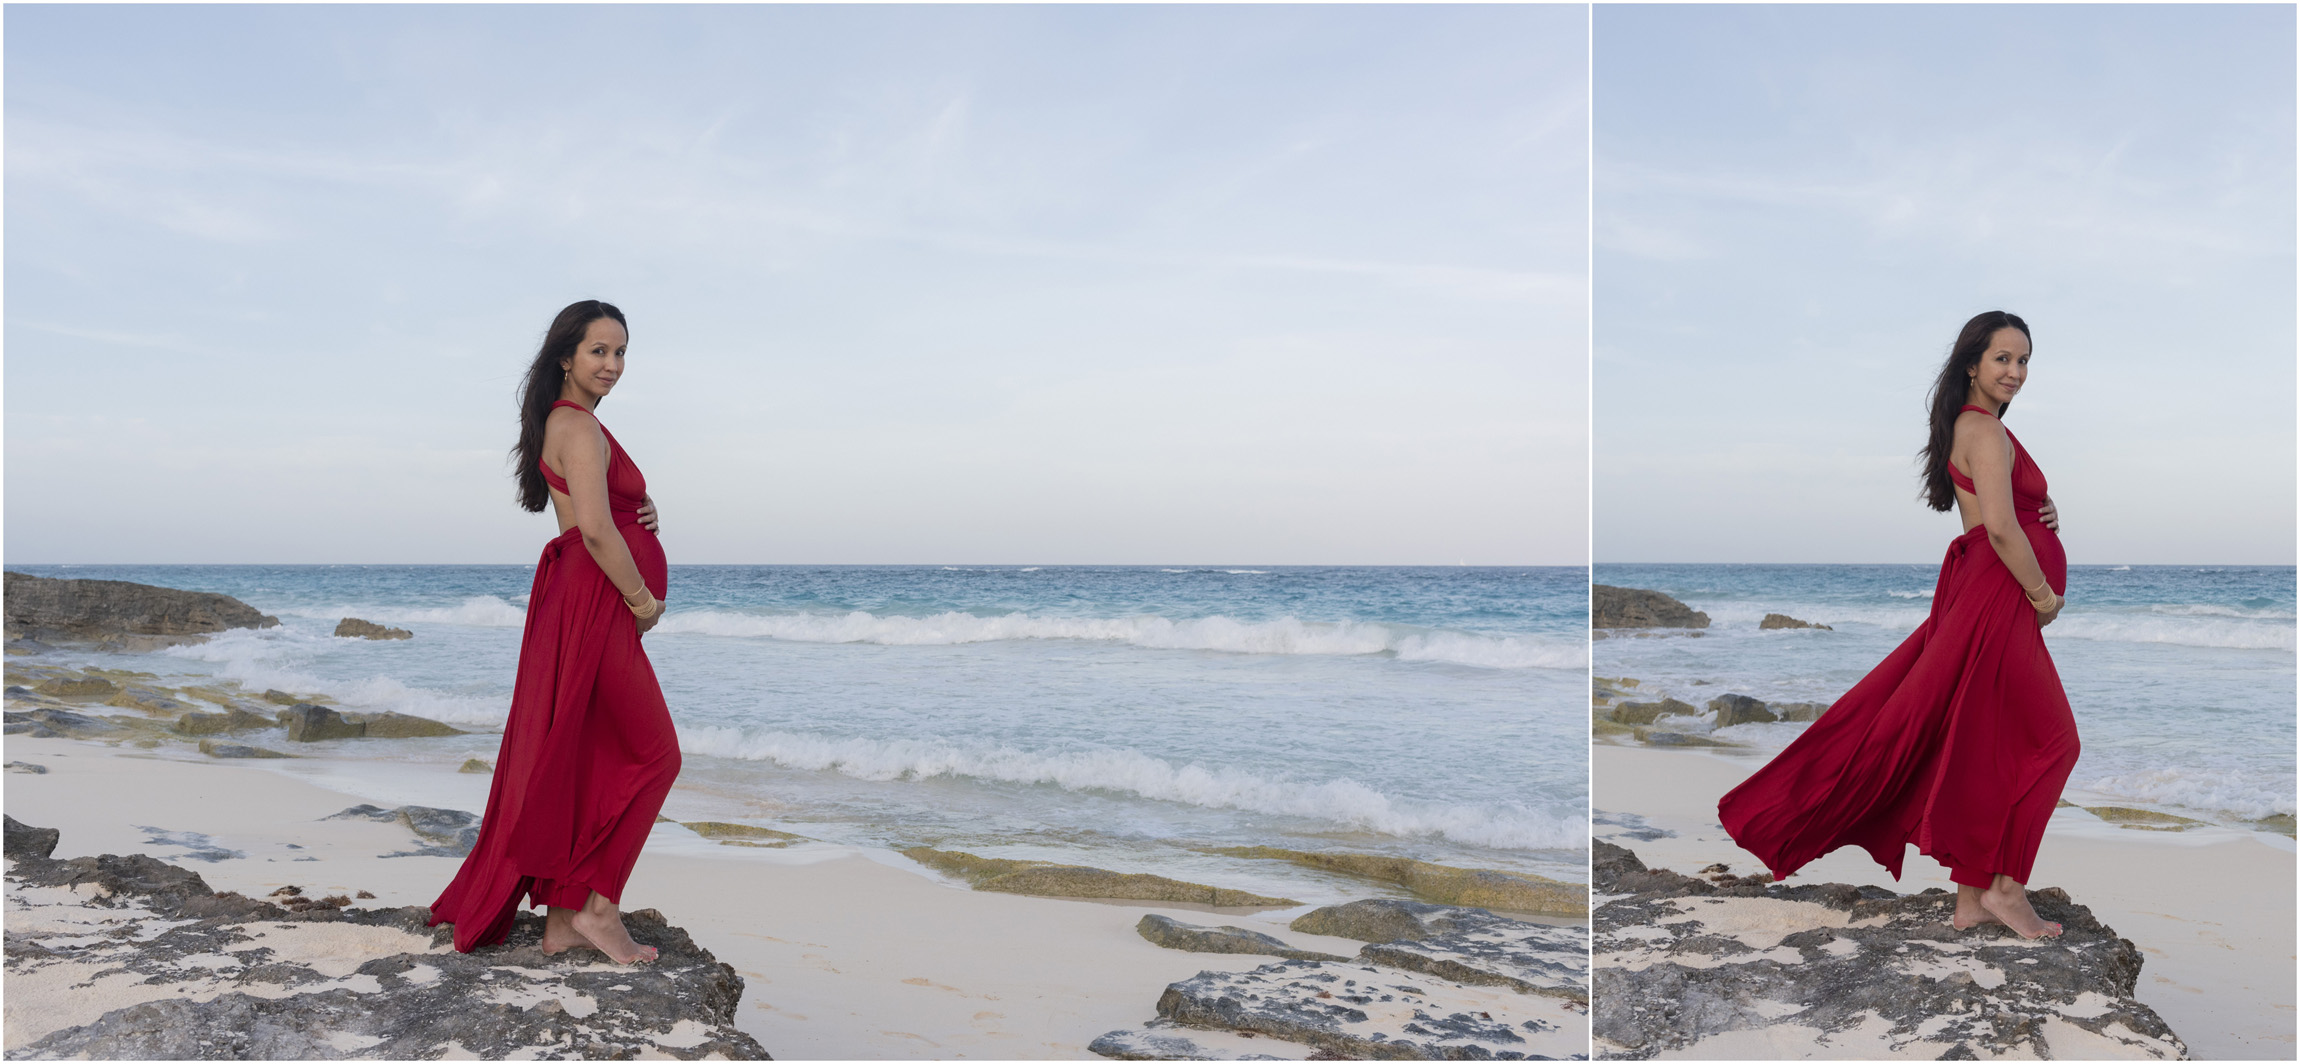 ©FianderFoto_Bermuda Maternity Photographer_Kat_John_J_005.jpg